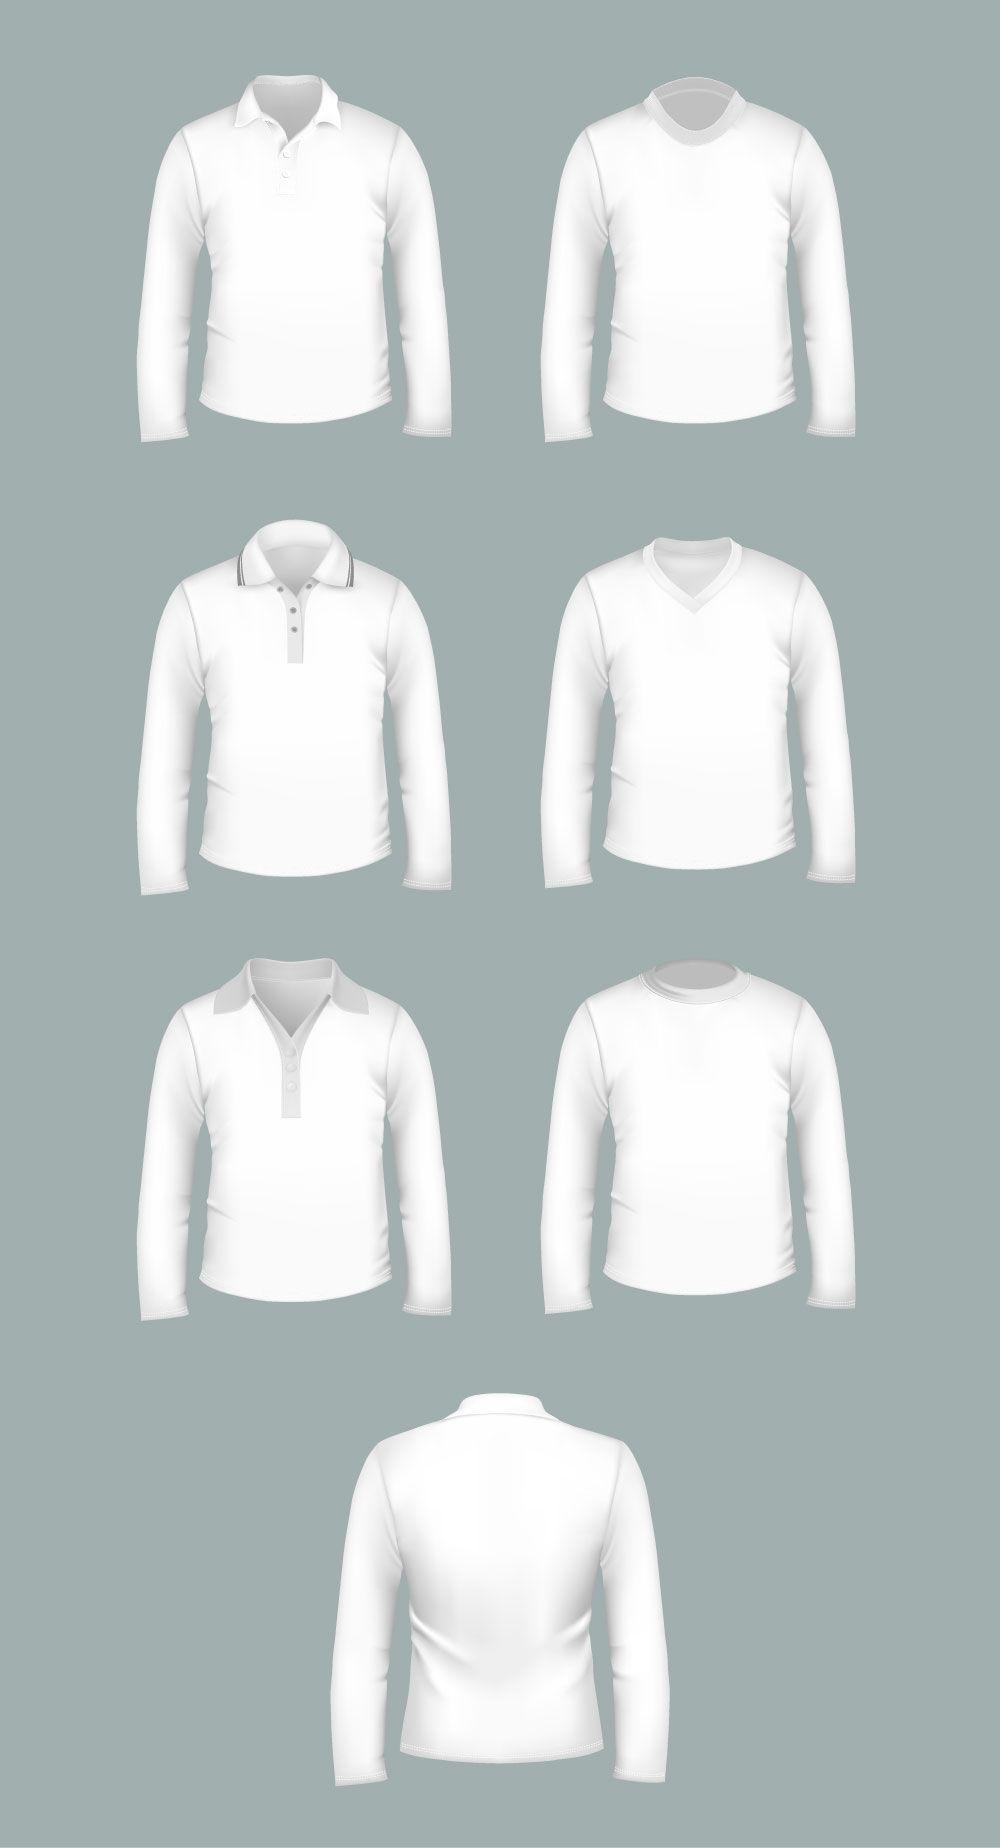 Download T Shirt Templates Pack Psd Vector Files Graphicsfuel Shirt Mockup Shirt Template Free Mockup